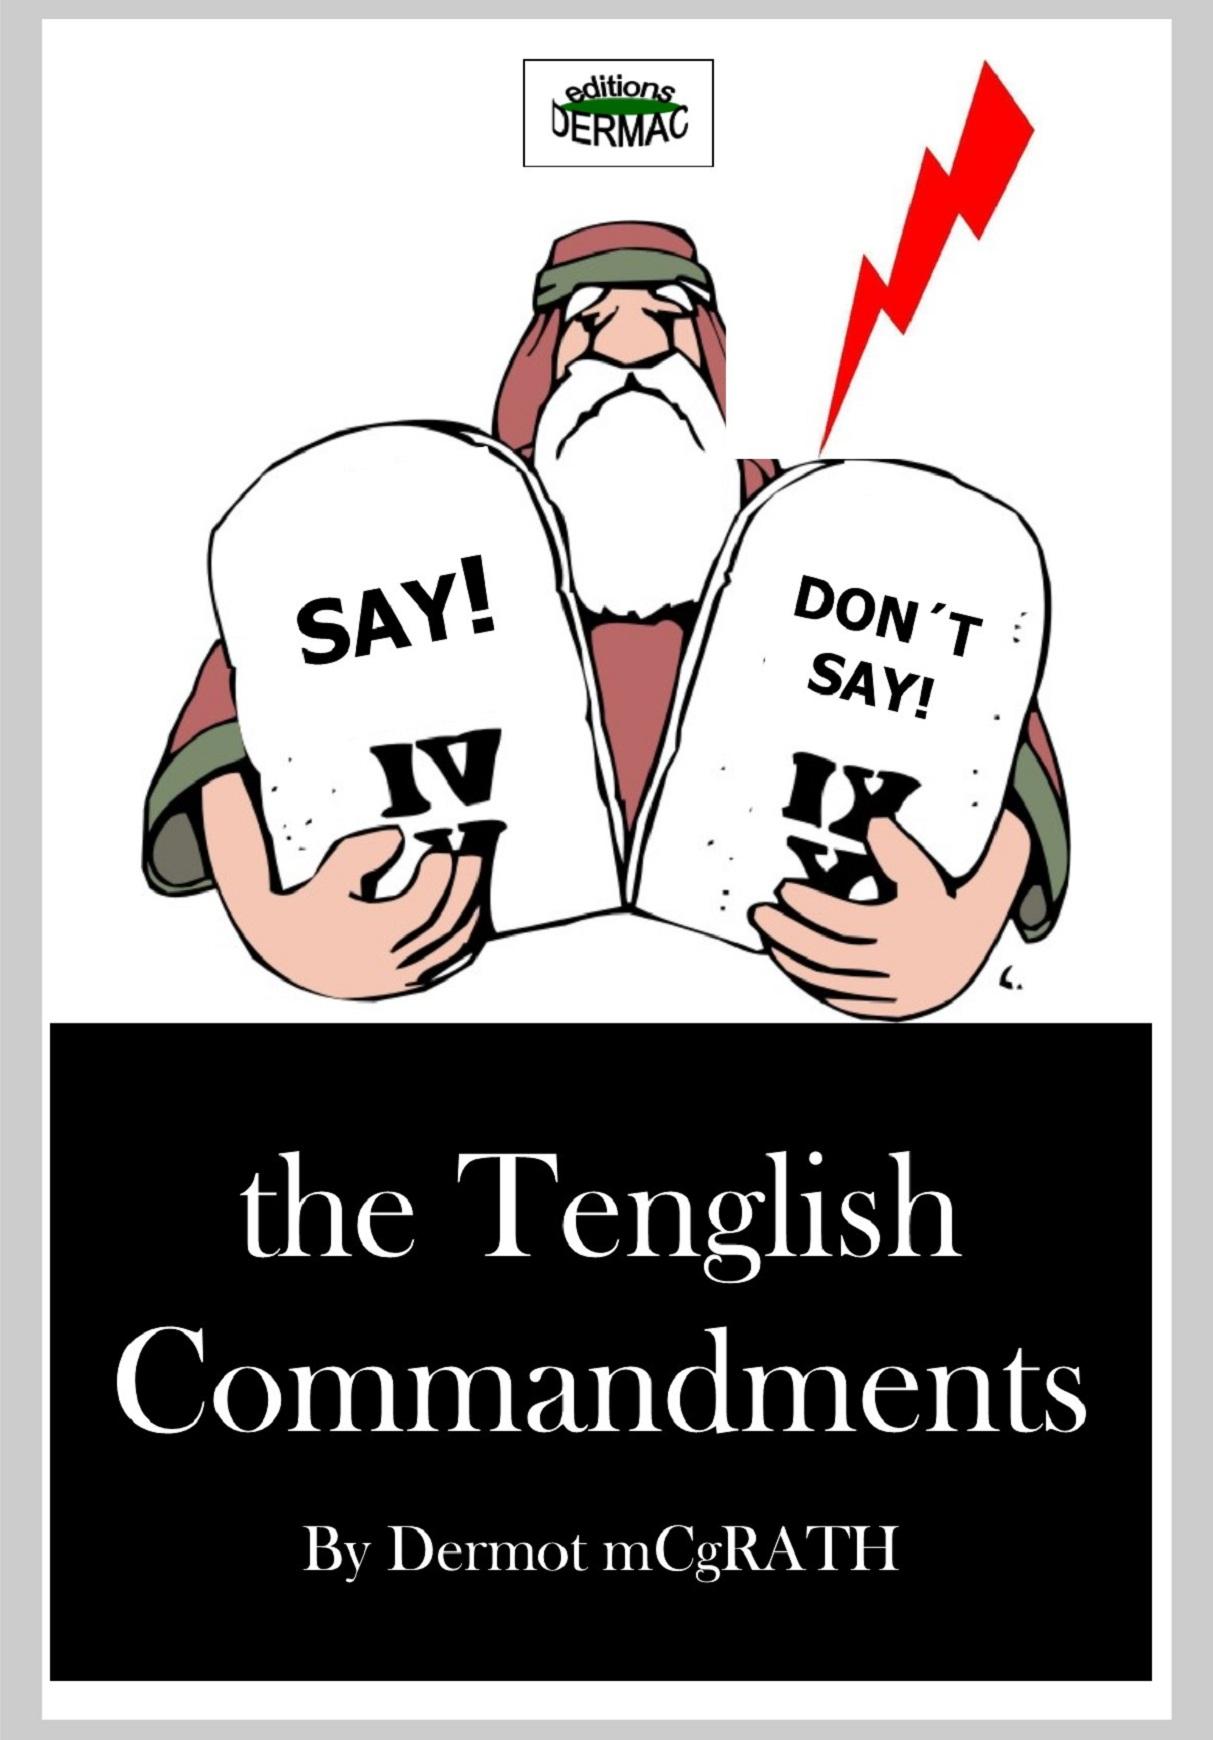 The Tenglish Commandments